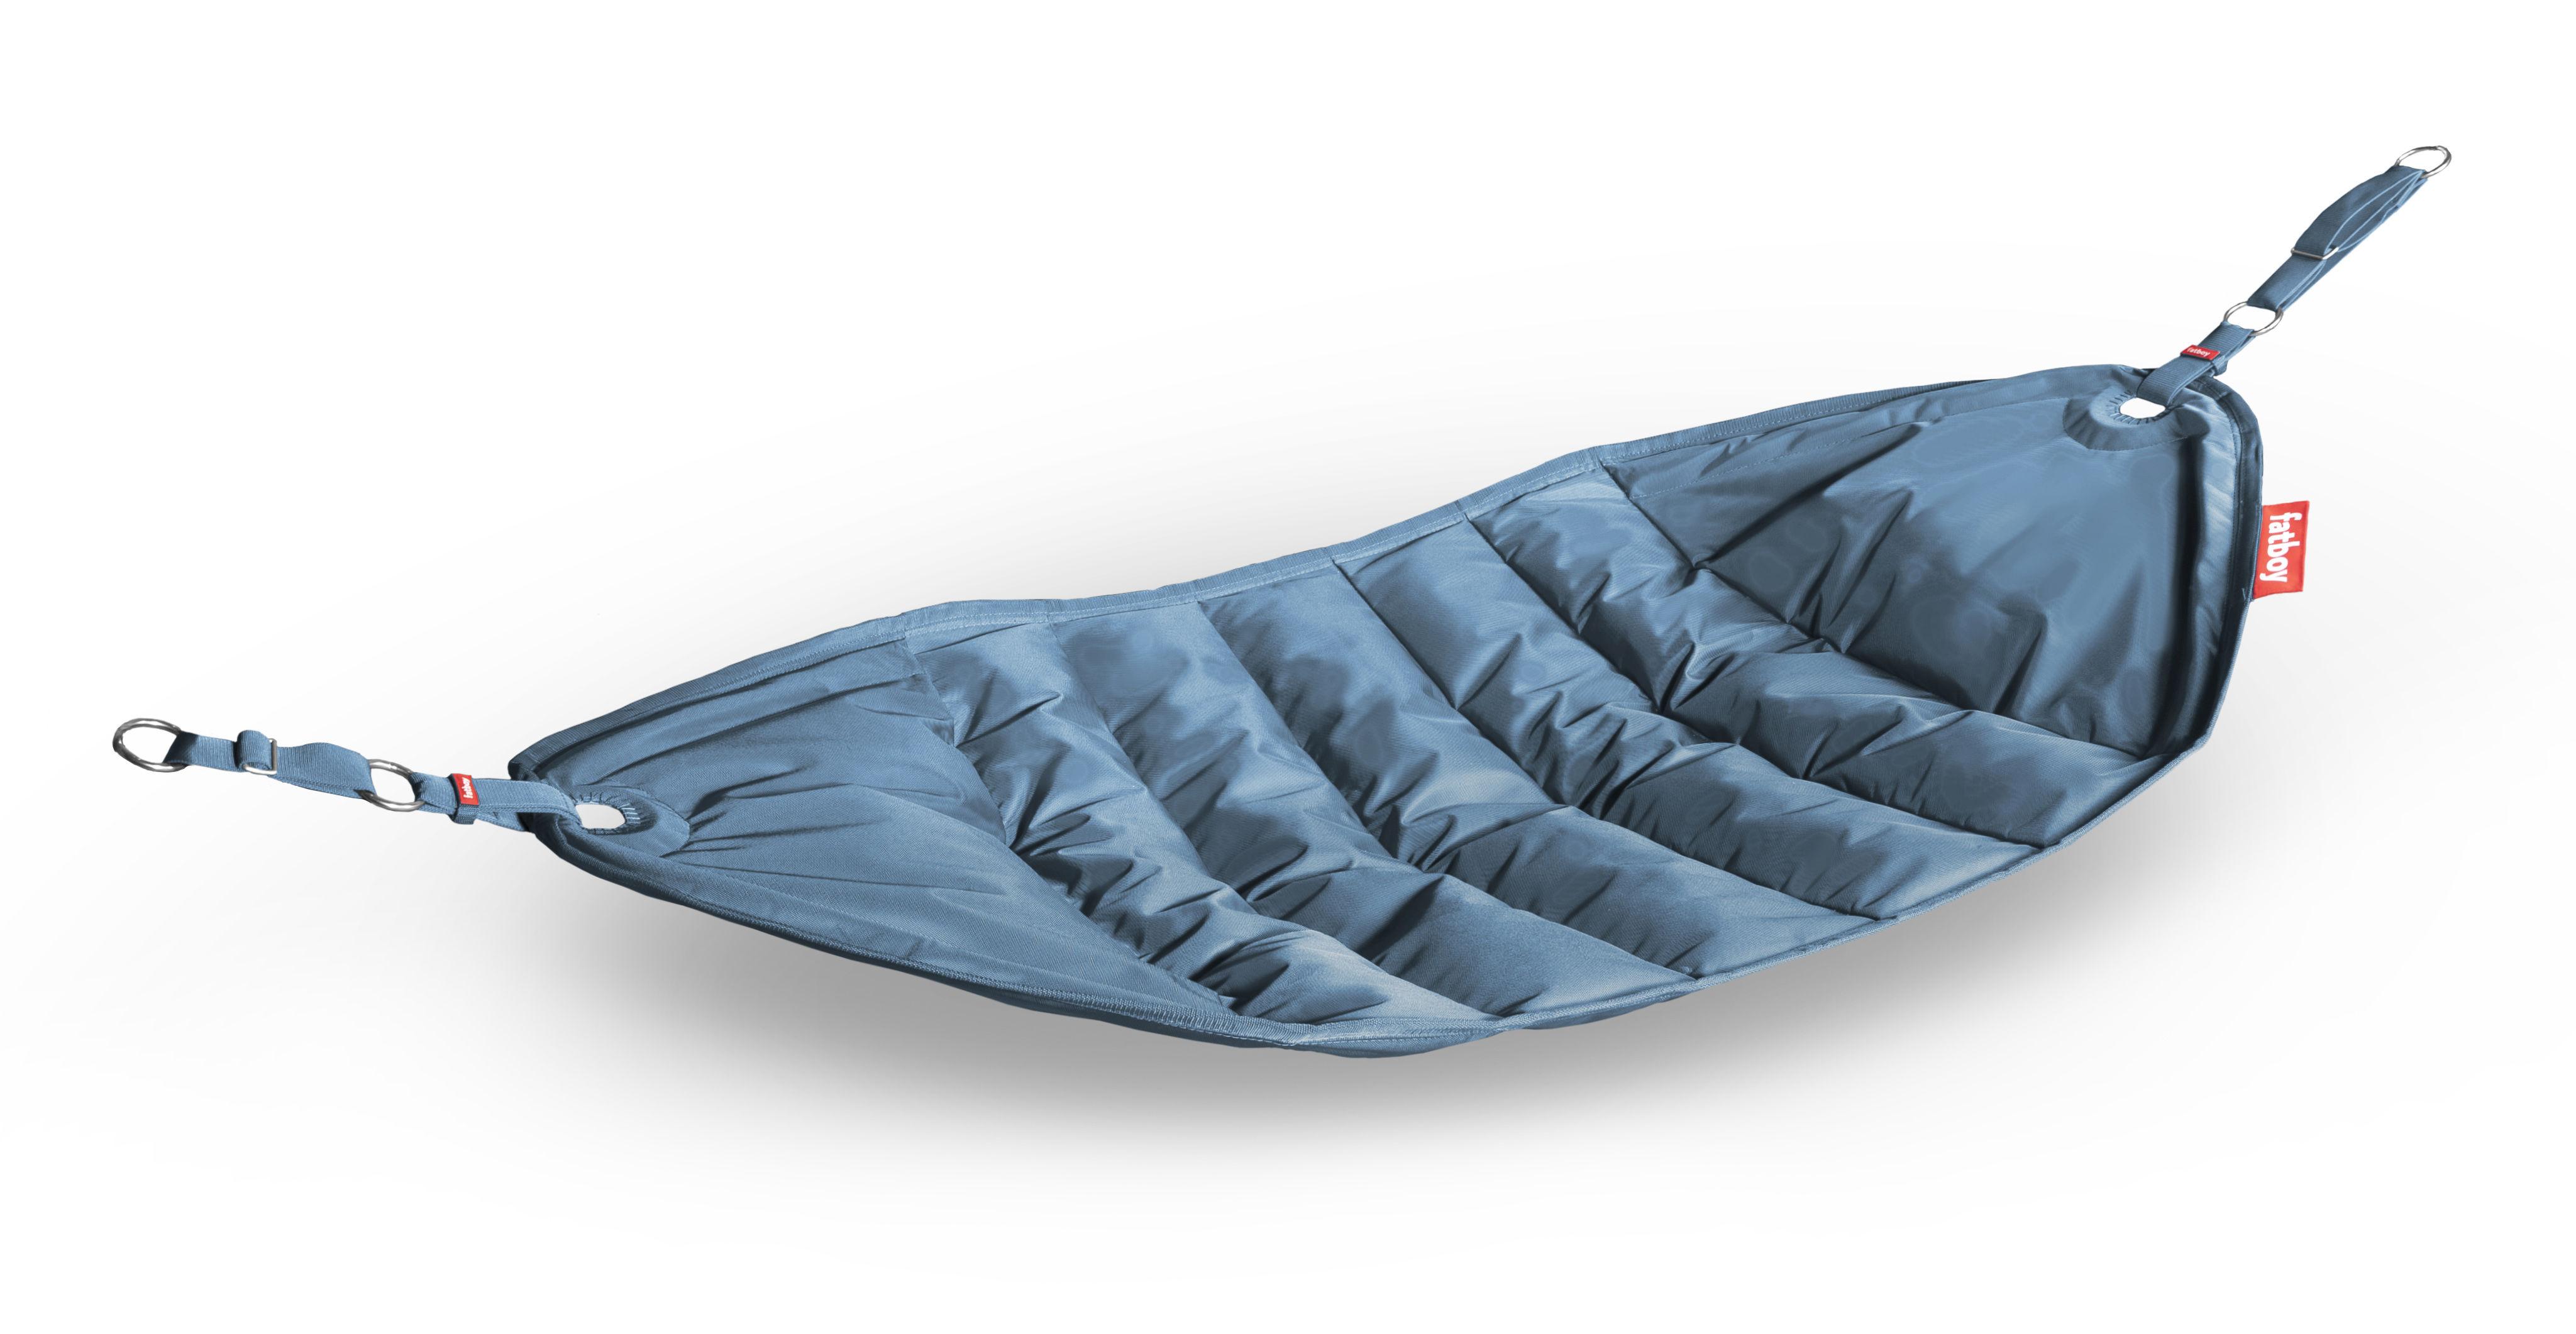 Outdoor - Sun Loungers & Hammocks - Headdepleck Hammock - / to hang up by Fatboy - Petrol blue - Polyester fibre, Tissu d'extérieur polyester